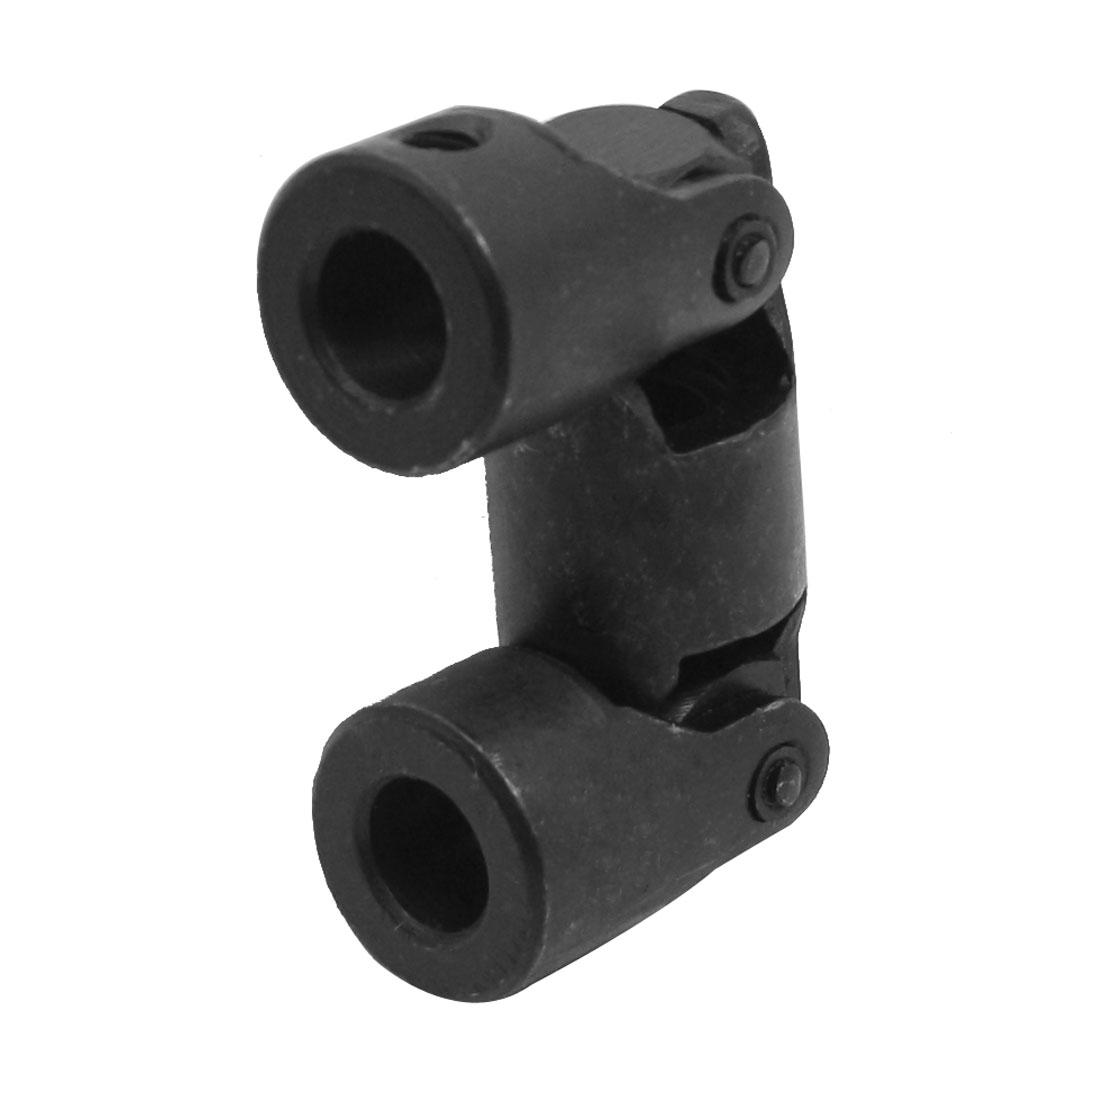 10mm Bore Dia 20mm Diameter 5mm Thread 82mm Long Groove Type Rotatable Black Metal Universal Joint